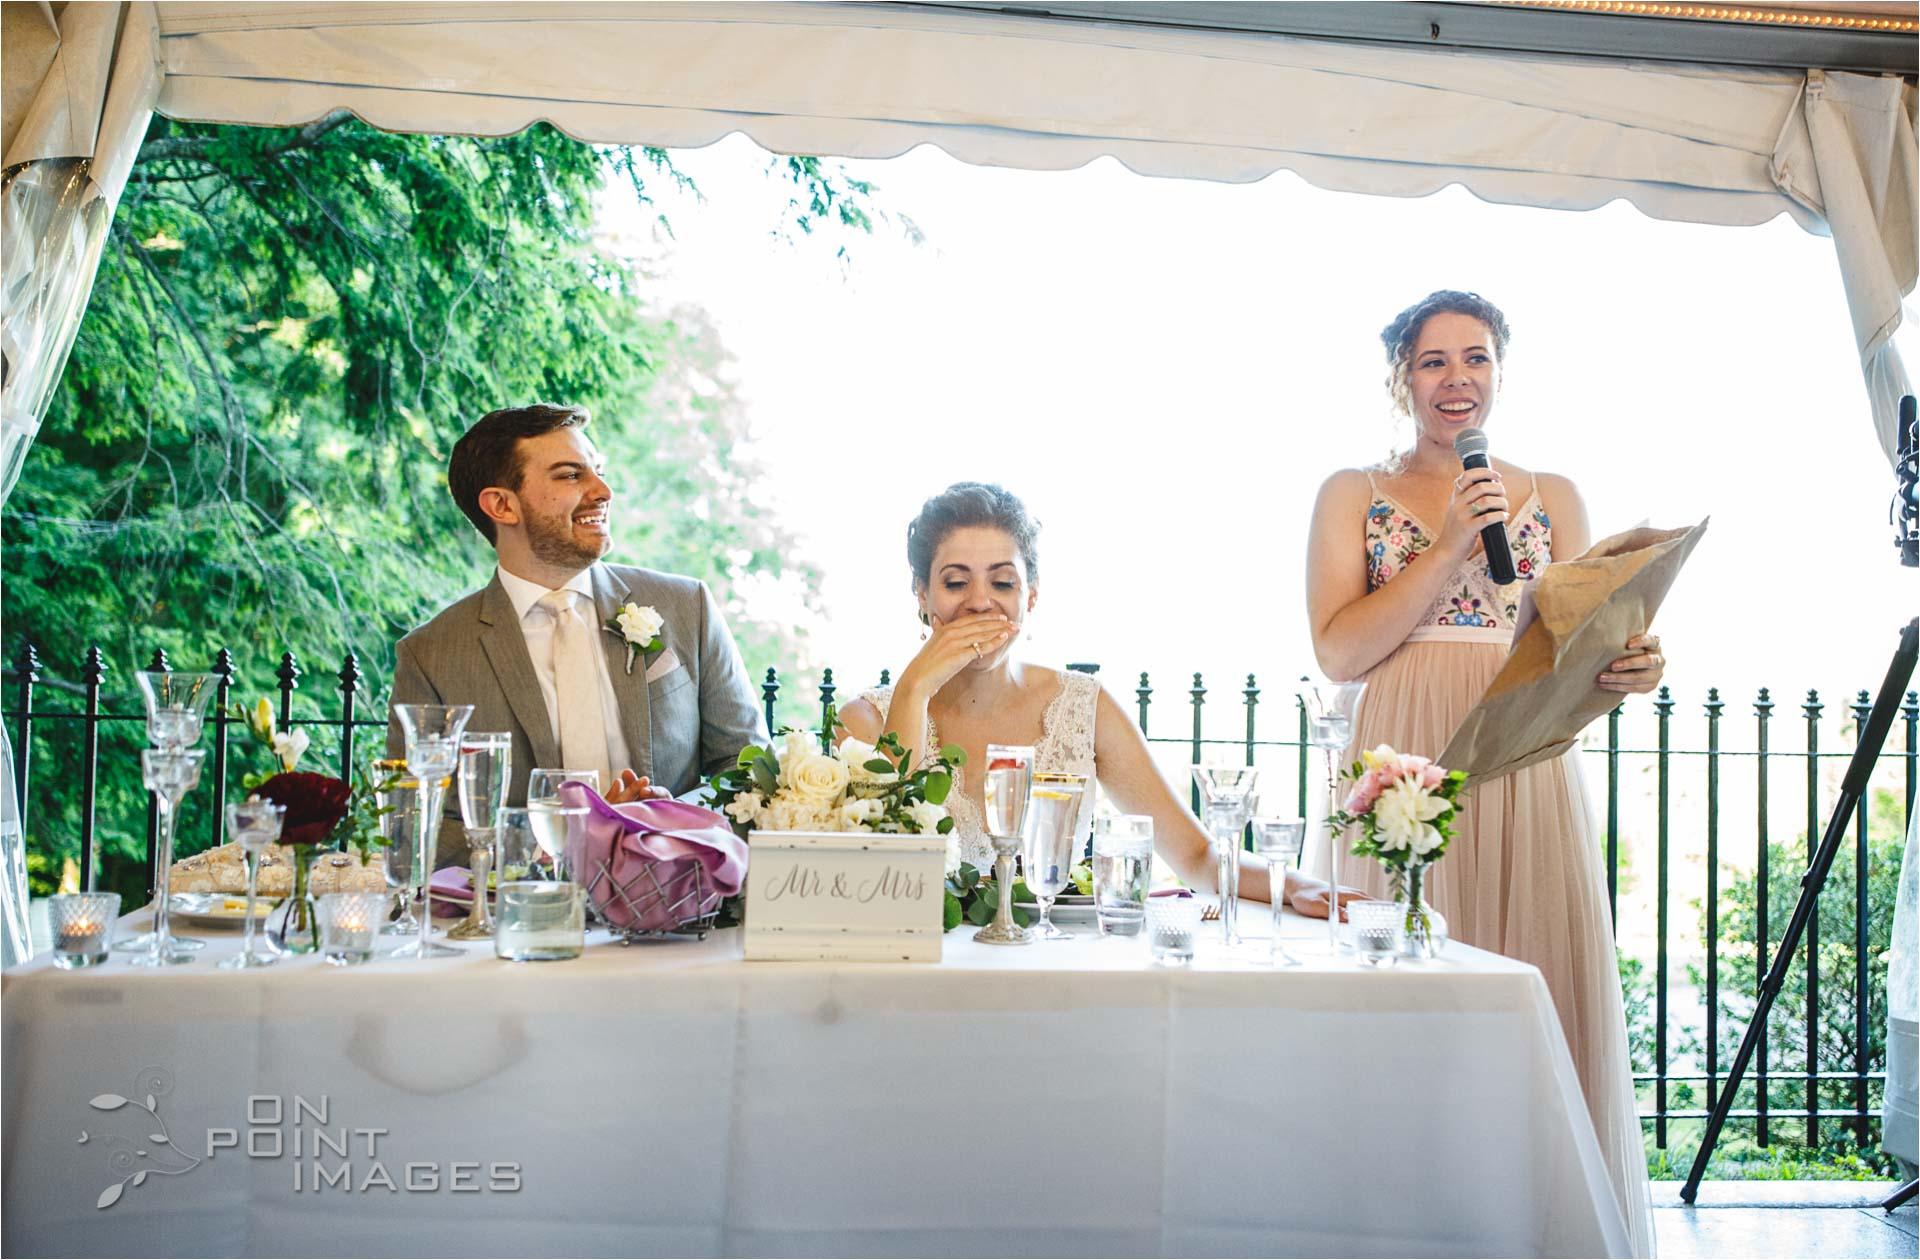 wickham-park-wedding-photographer-ct-31.jpg